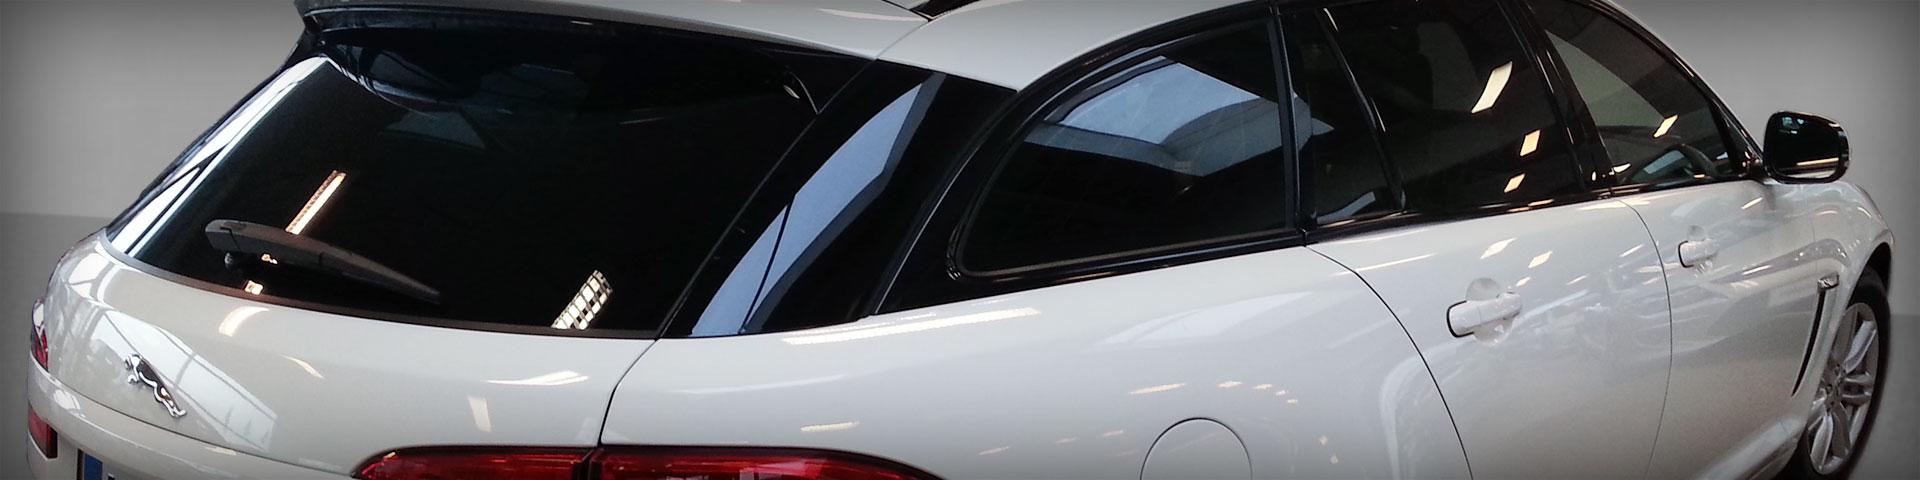 solfilm-til-biler-jaguar